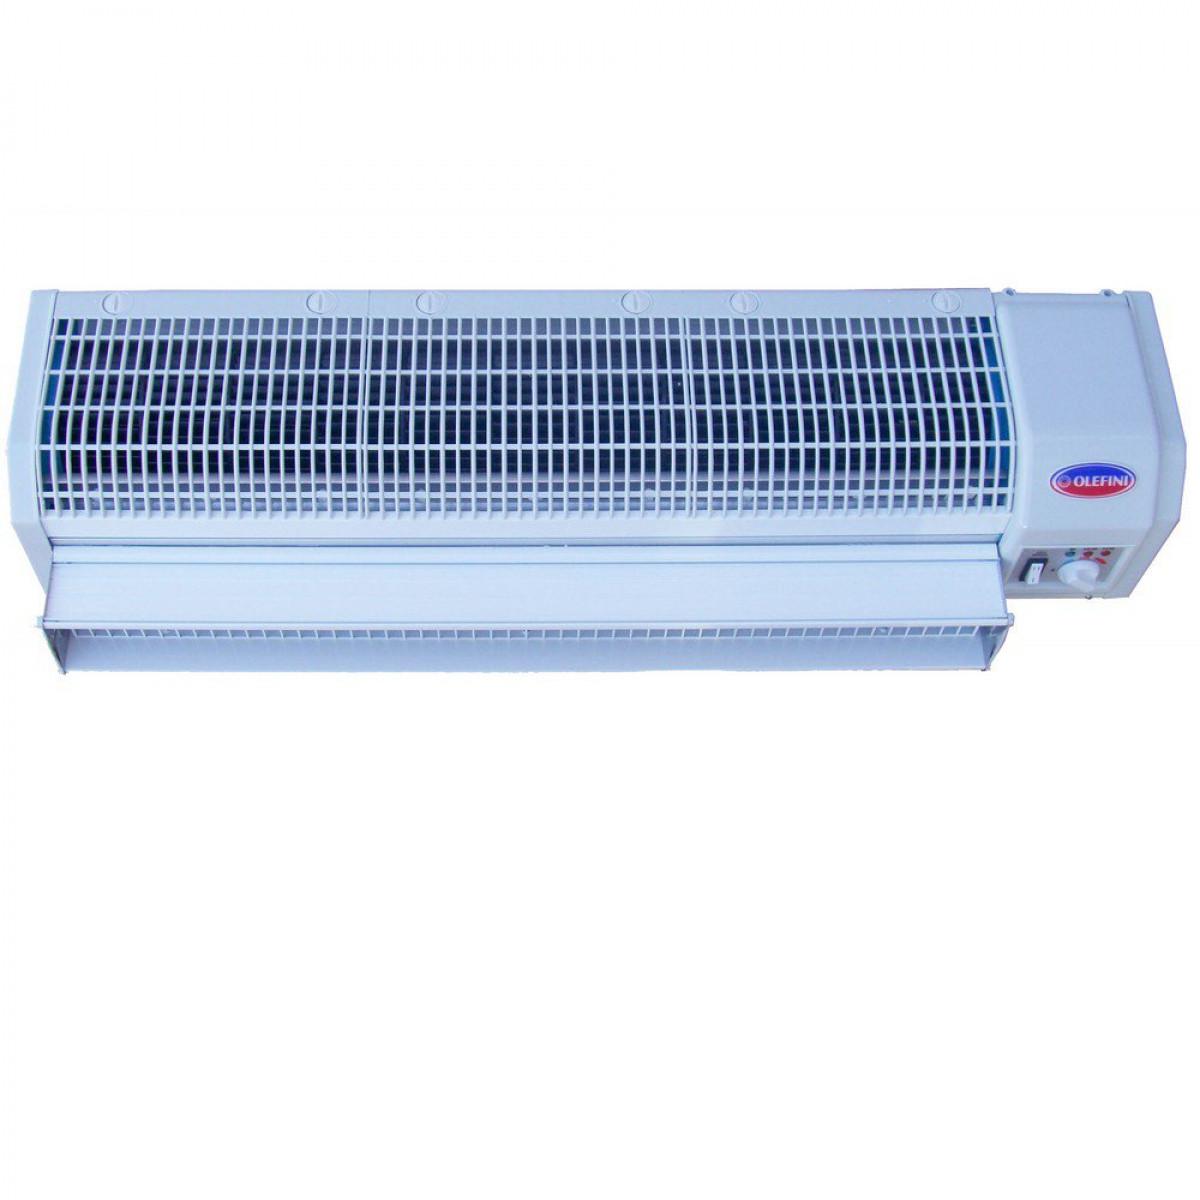 Воздушная тепловая завеса Olefini Mini-800S Intellect